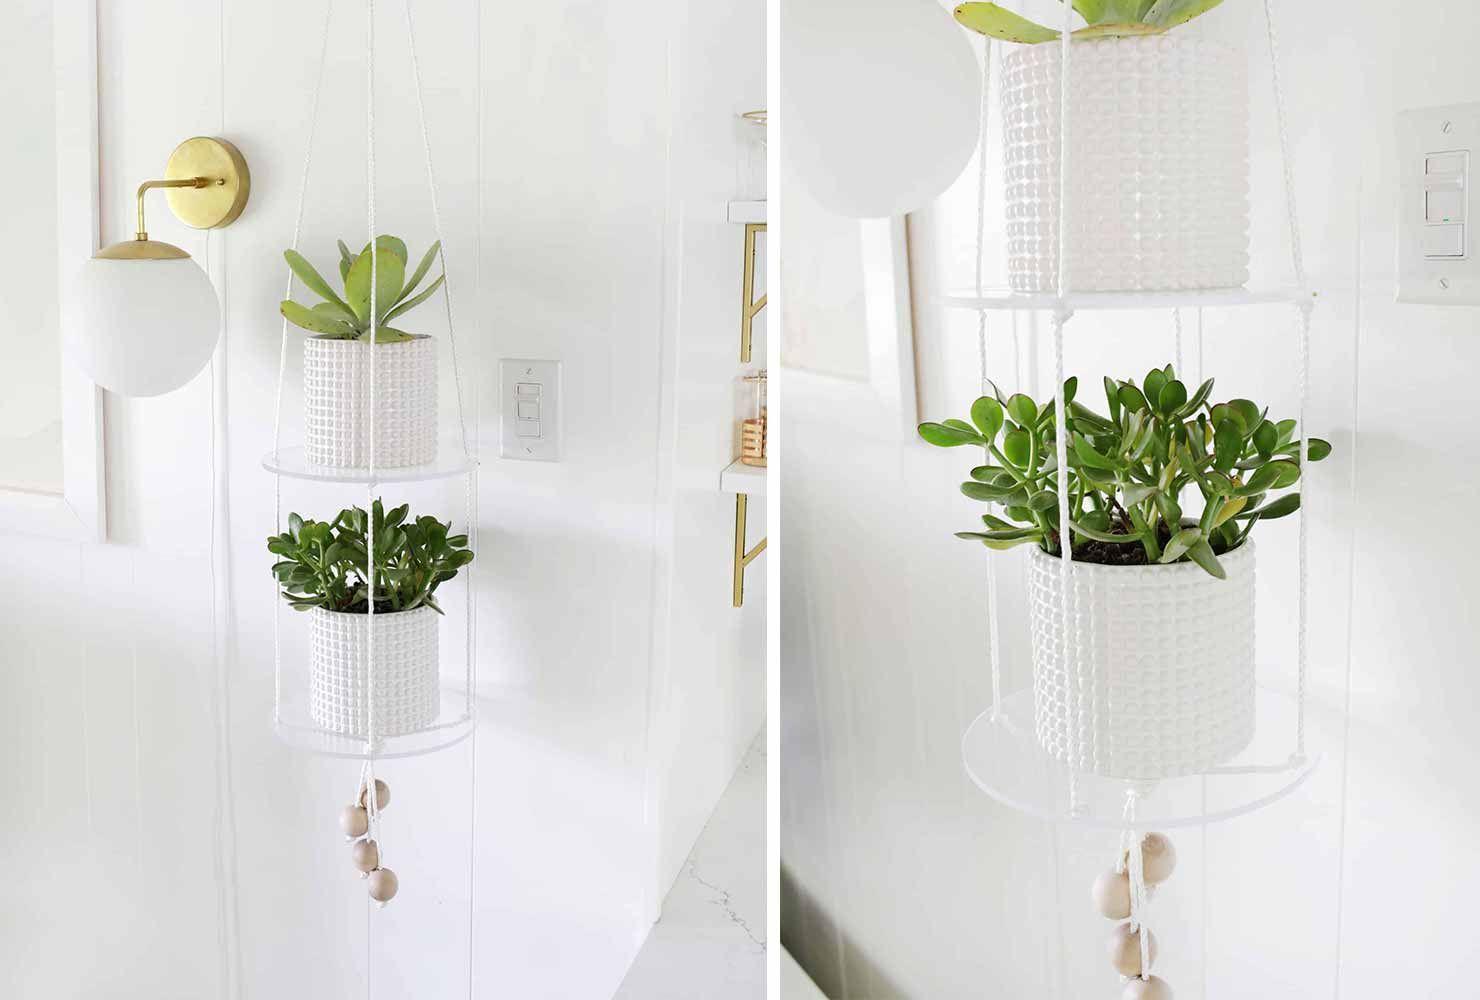 65 ingenious indoor plant decor ideas  shutterfly in 2020